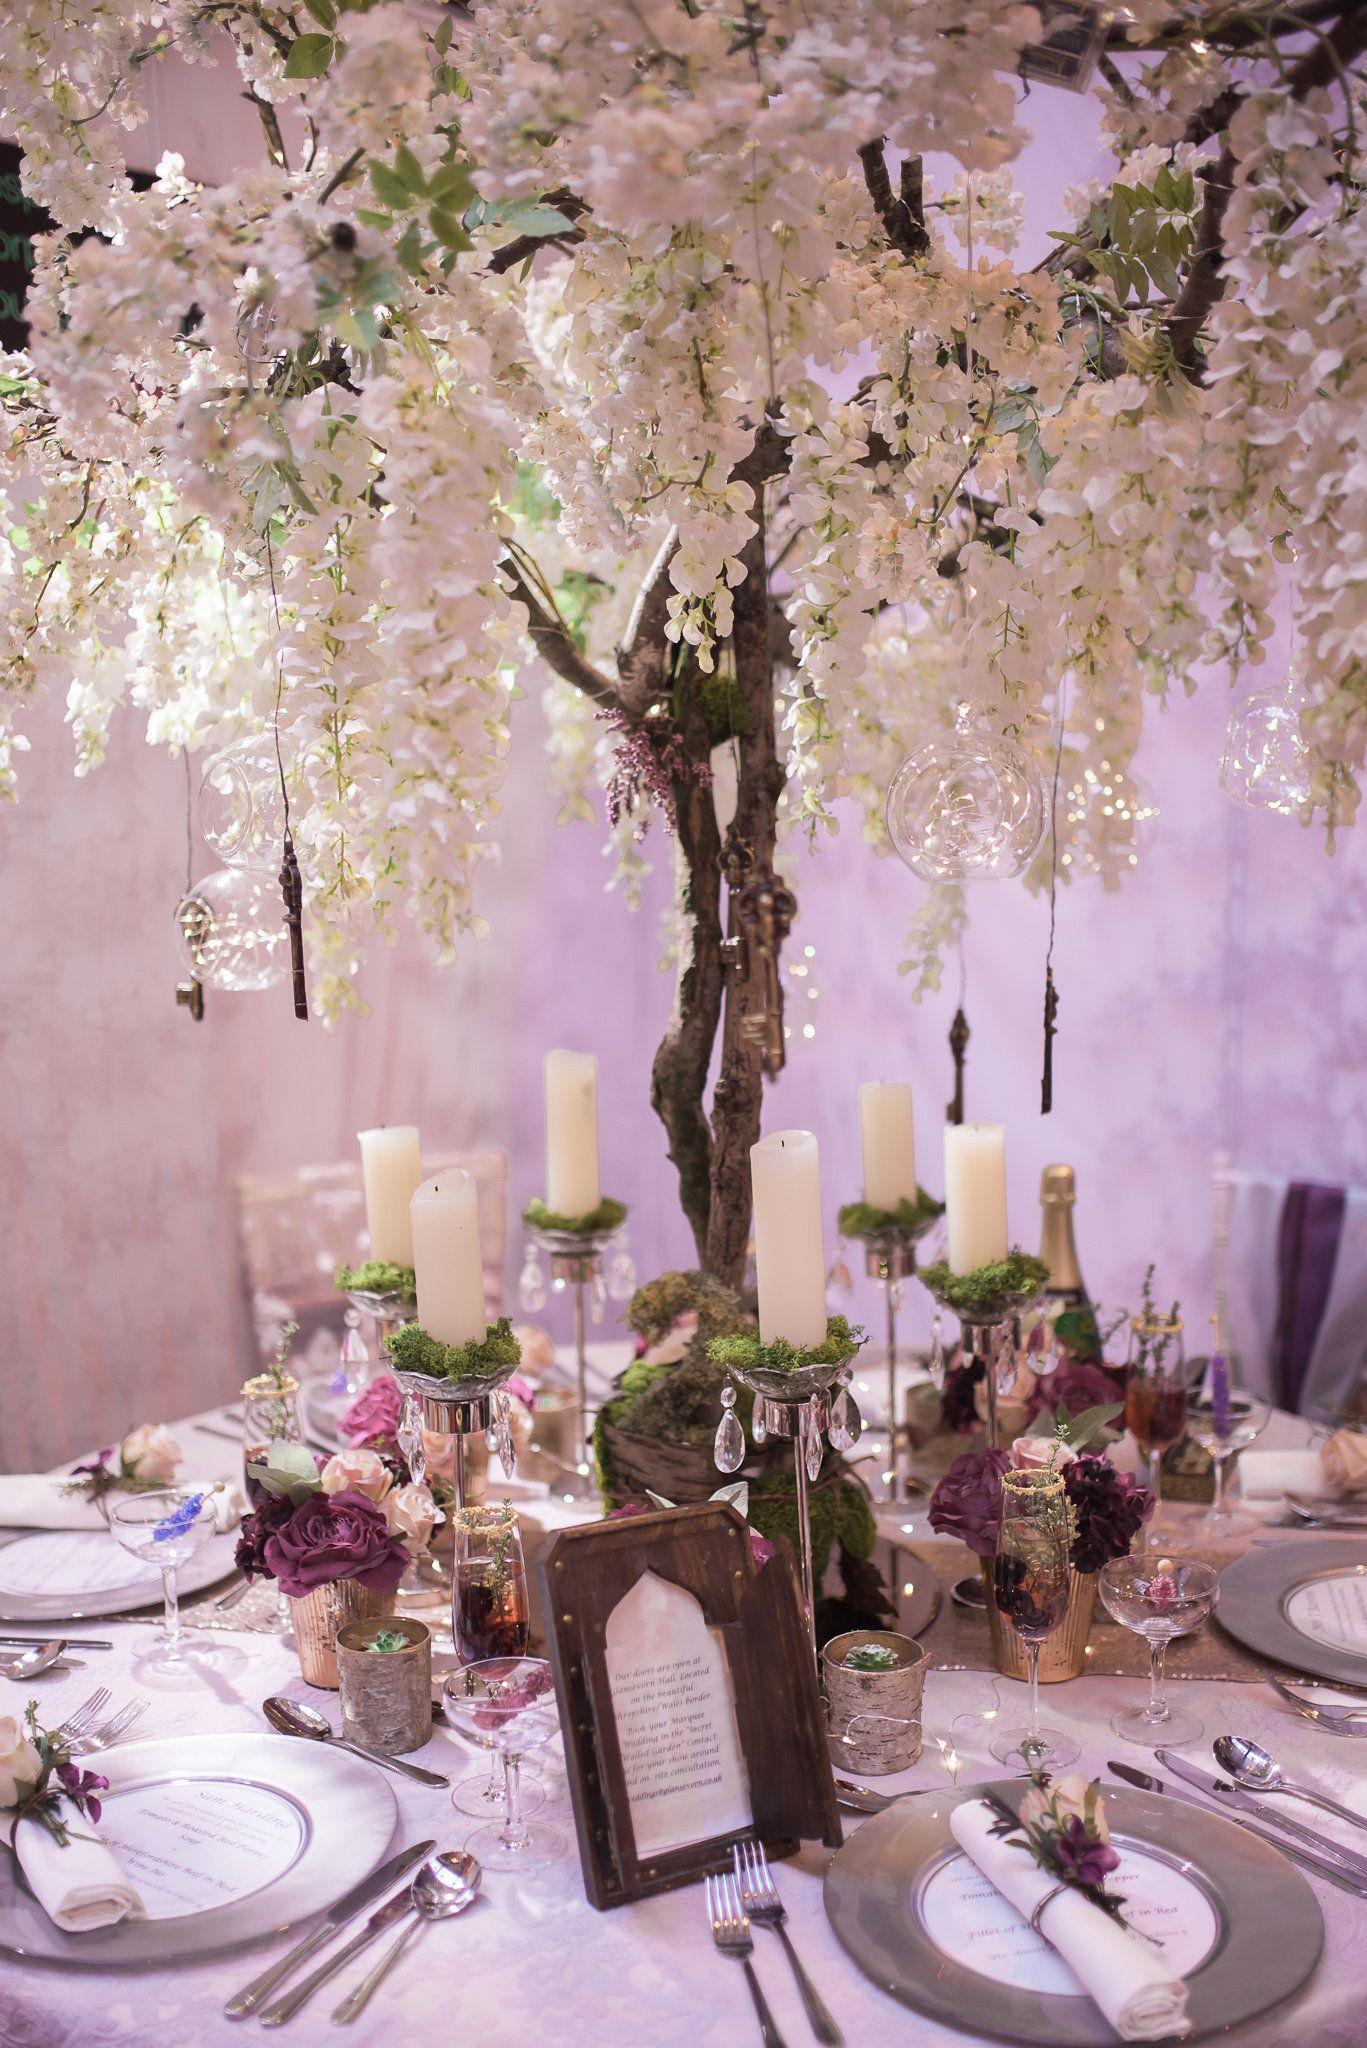 Bespoke Venue Wedding Stylists Blossom Trees For Hire Decoration Shropshire West